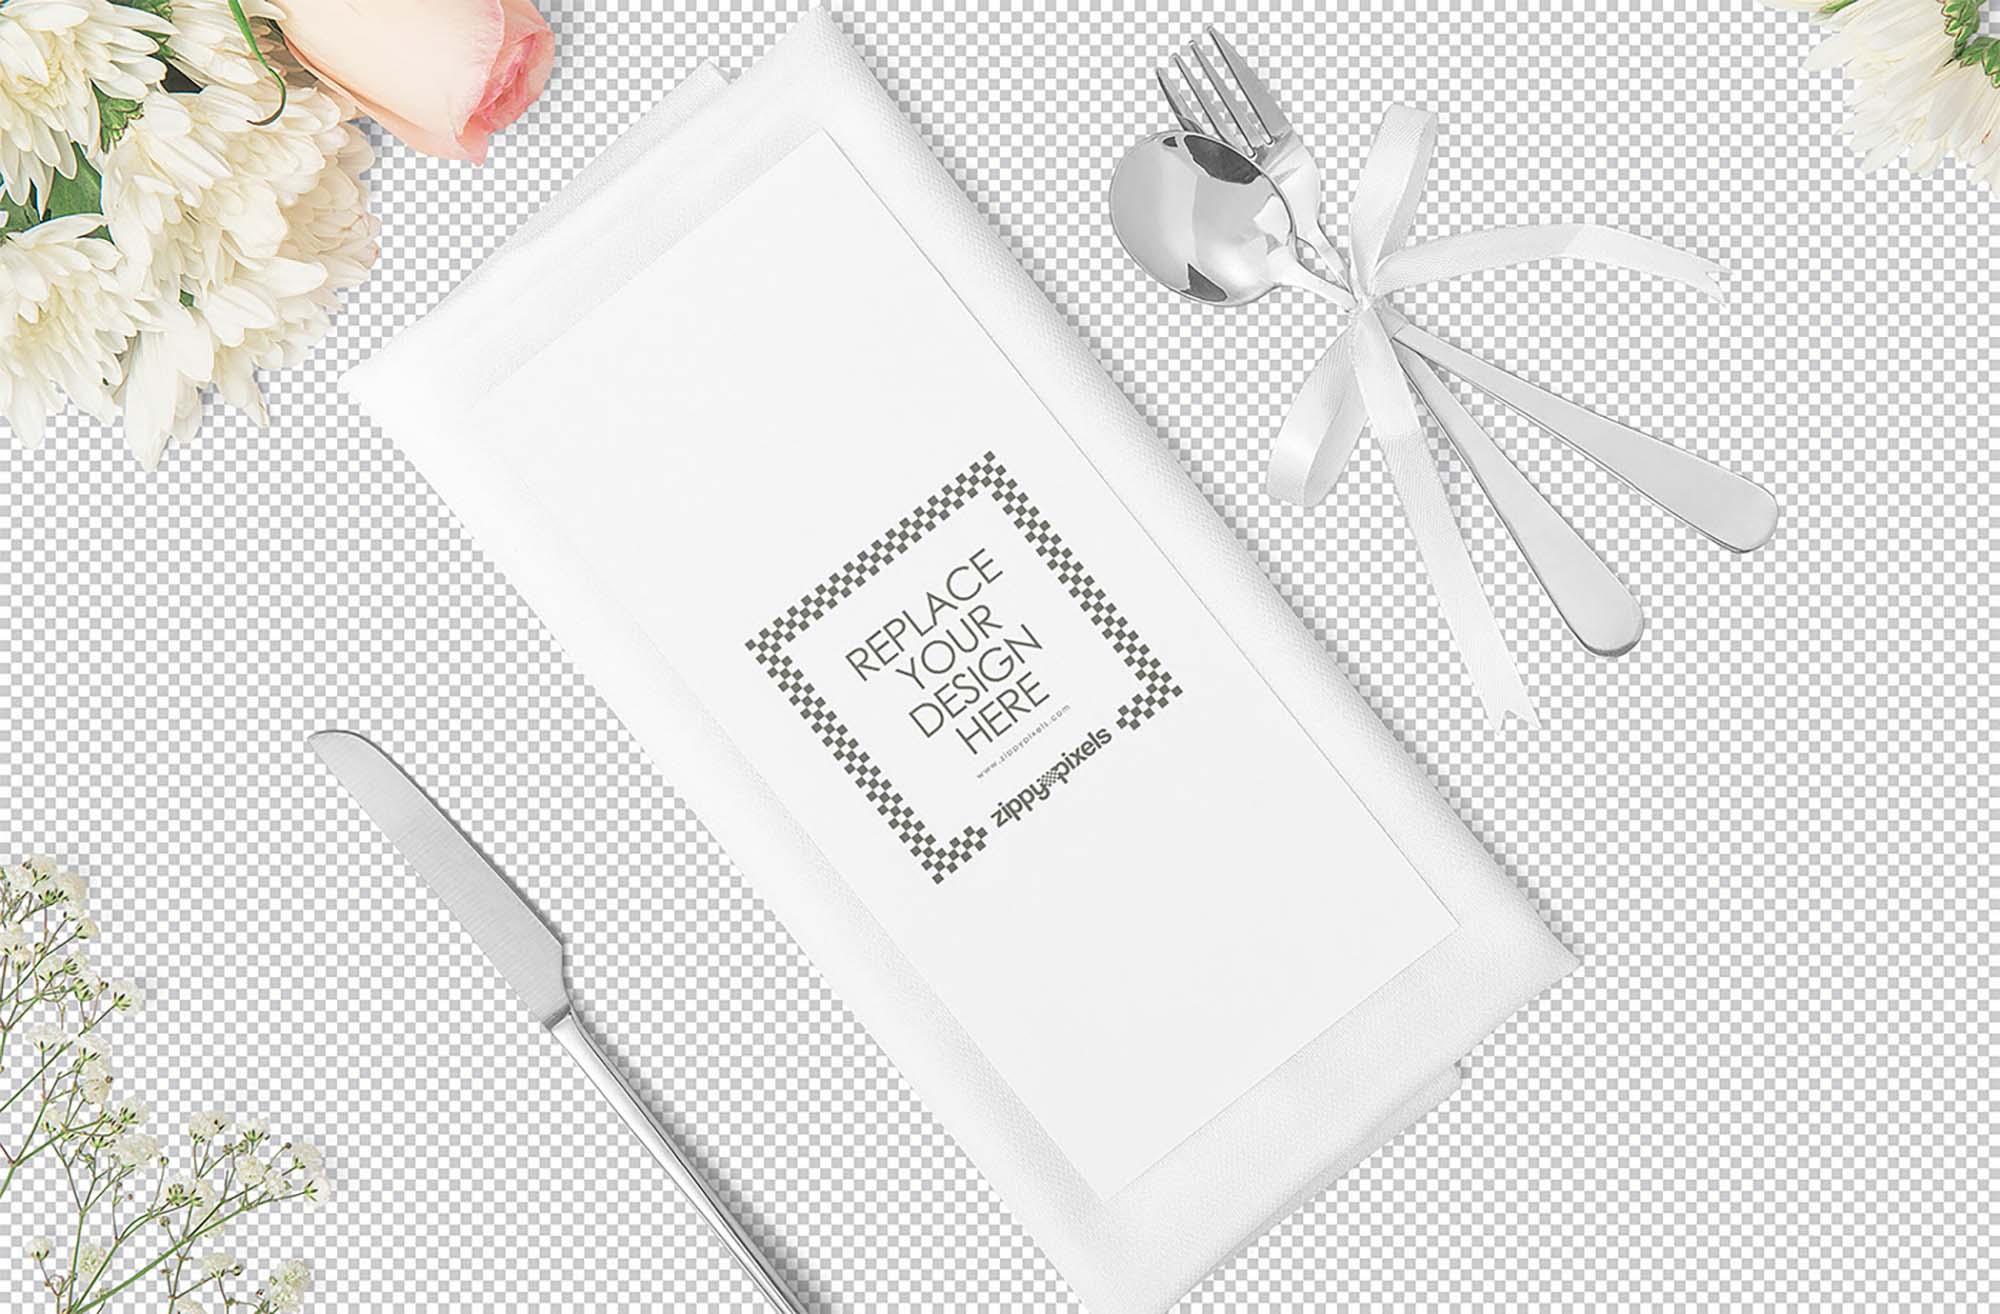 Foldable Restaurant Menu Mockup 2